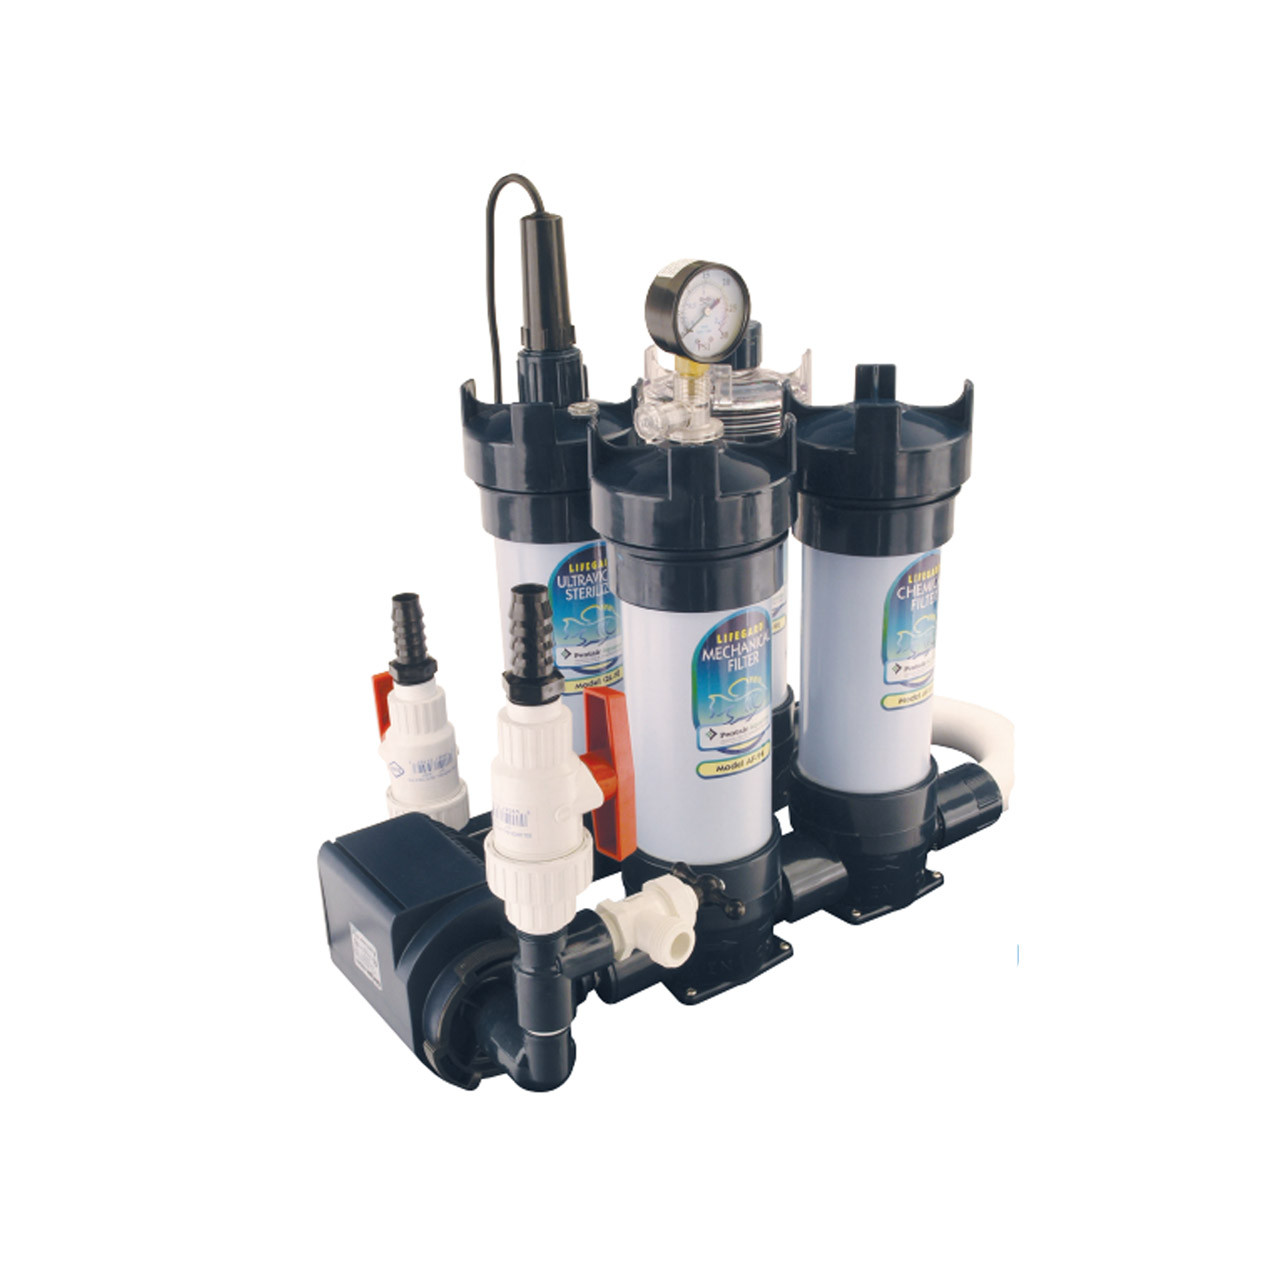 Sistema modular enlinea preensamblado Lifegard Aquatics (Bomba, Filtro mecanico, Filtro Quimico, Calentador, Filtro ultravioleta)